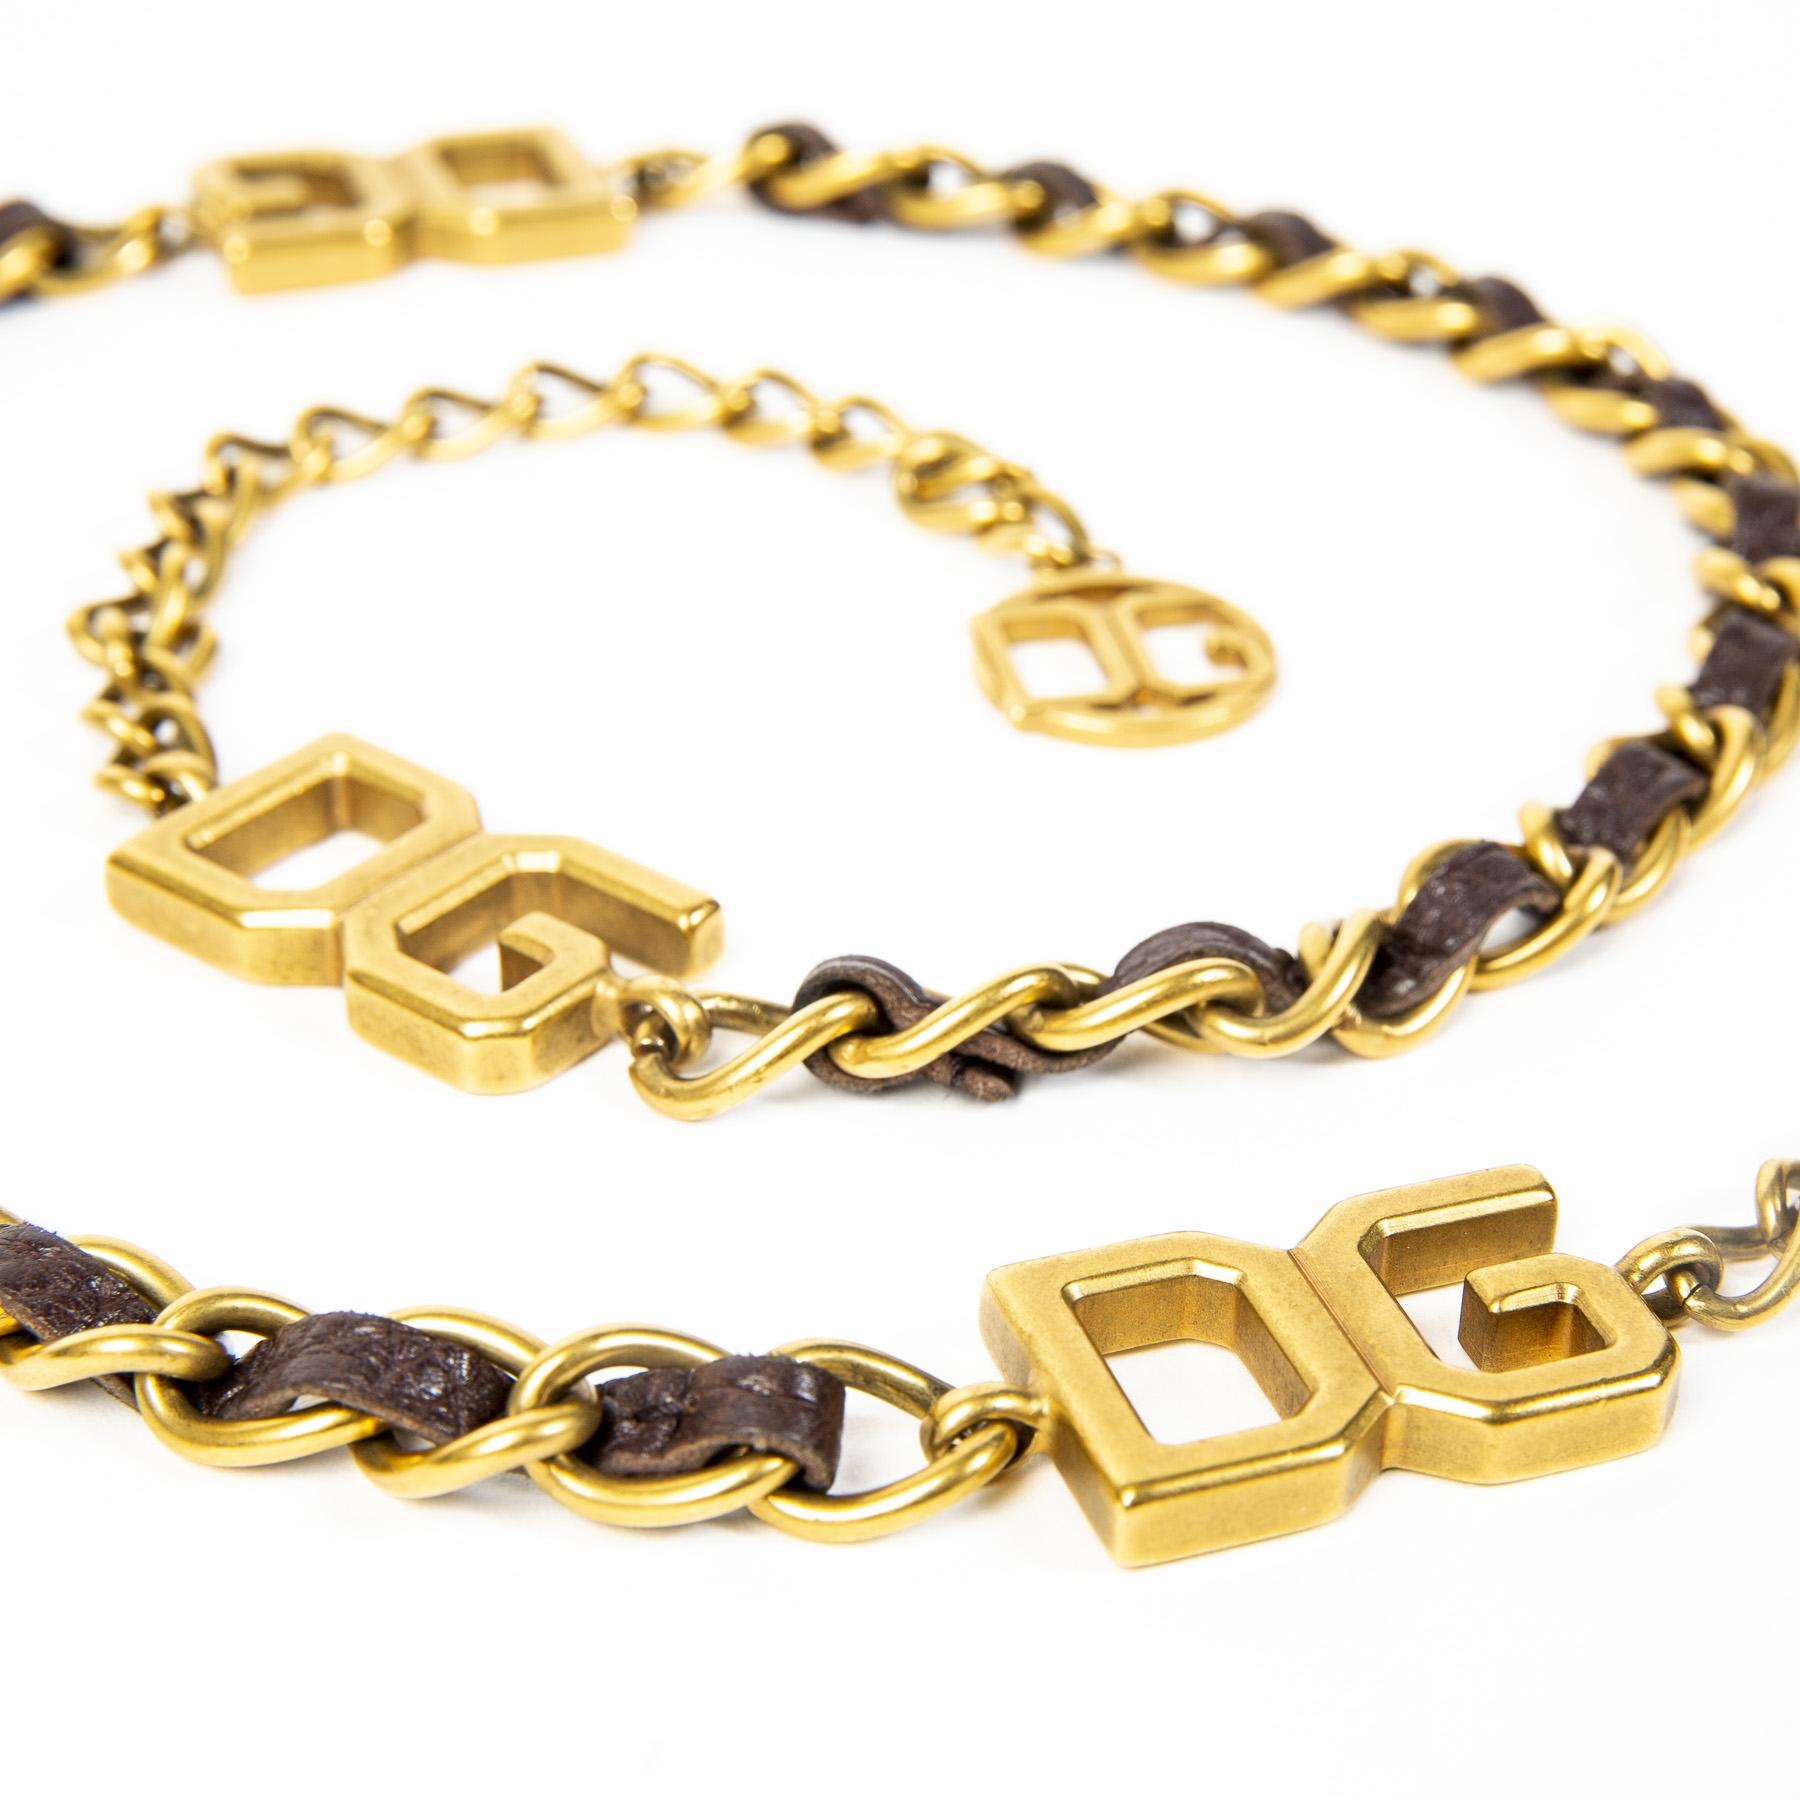 Dolce & Gabbana Leather and Chain Belt - SIze 80. Buy authentic secondhand chain belt D&G items at labellov antwerp. Veilige betaling. Koop online echte tweedehands designer items van D&G bij labellov. Safe payment. Designer vintage.